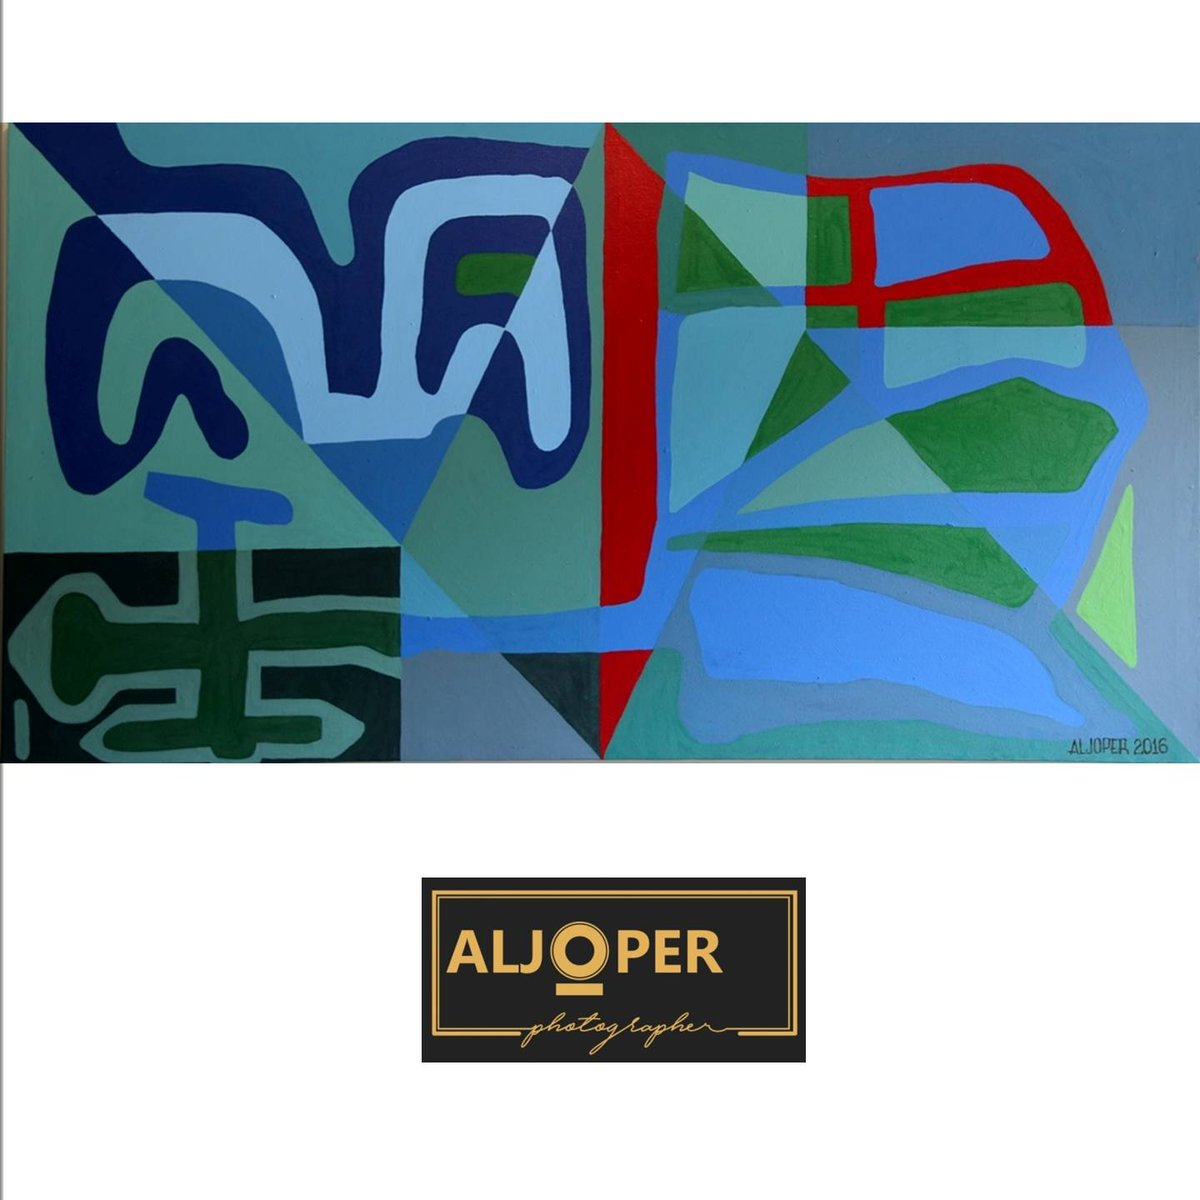 Obra de arte. Técnica: Acrílico sobre lienzo. @Aljoper #UnAlJoper #Aljoper #Aljoper2020 #ObraDeArte #ArteVenezolano #RegalaArte #CompraArte pic.twitter.com/Gj0OdsL78T